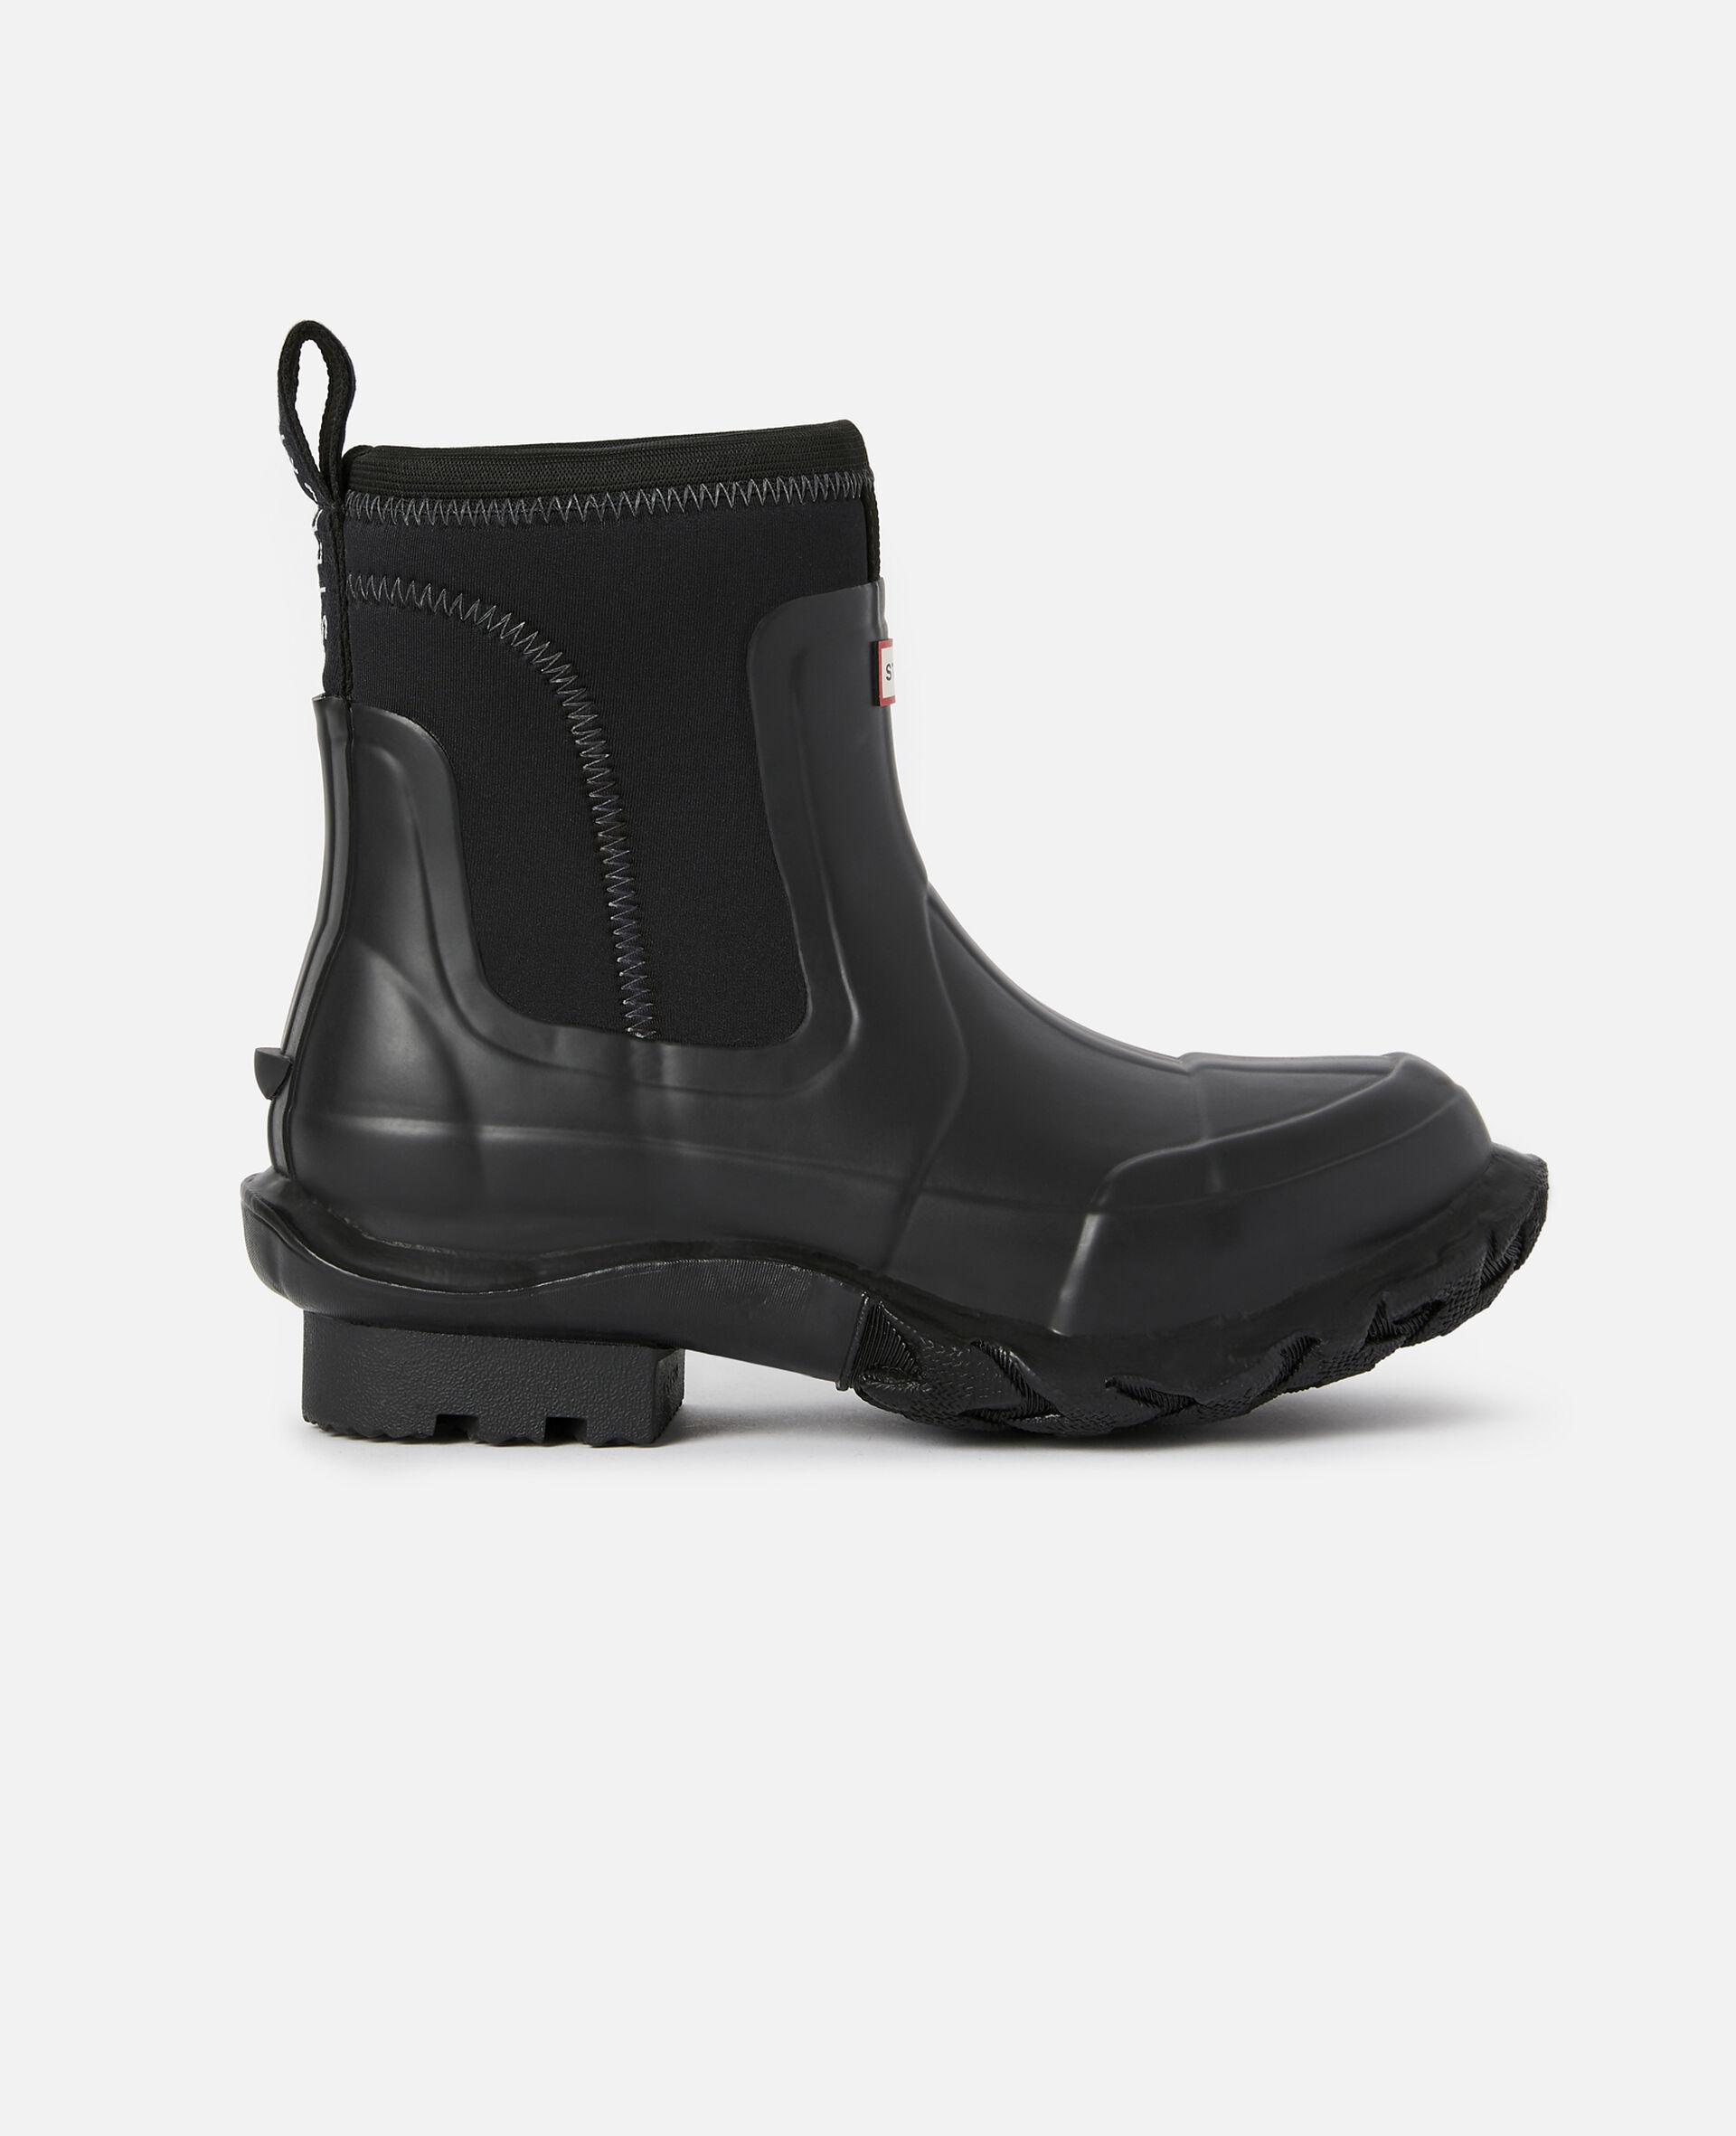 Women's Stella x Hunter Boots-Schwarz-large image number 0